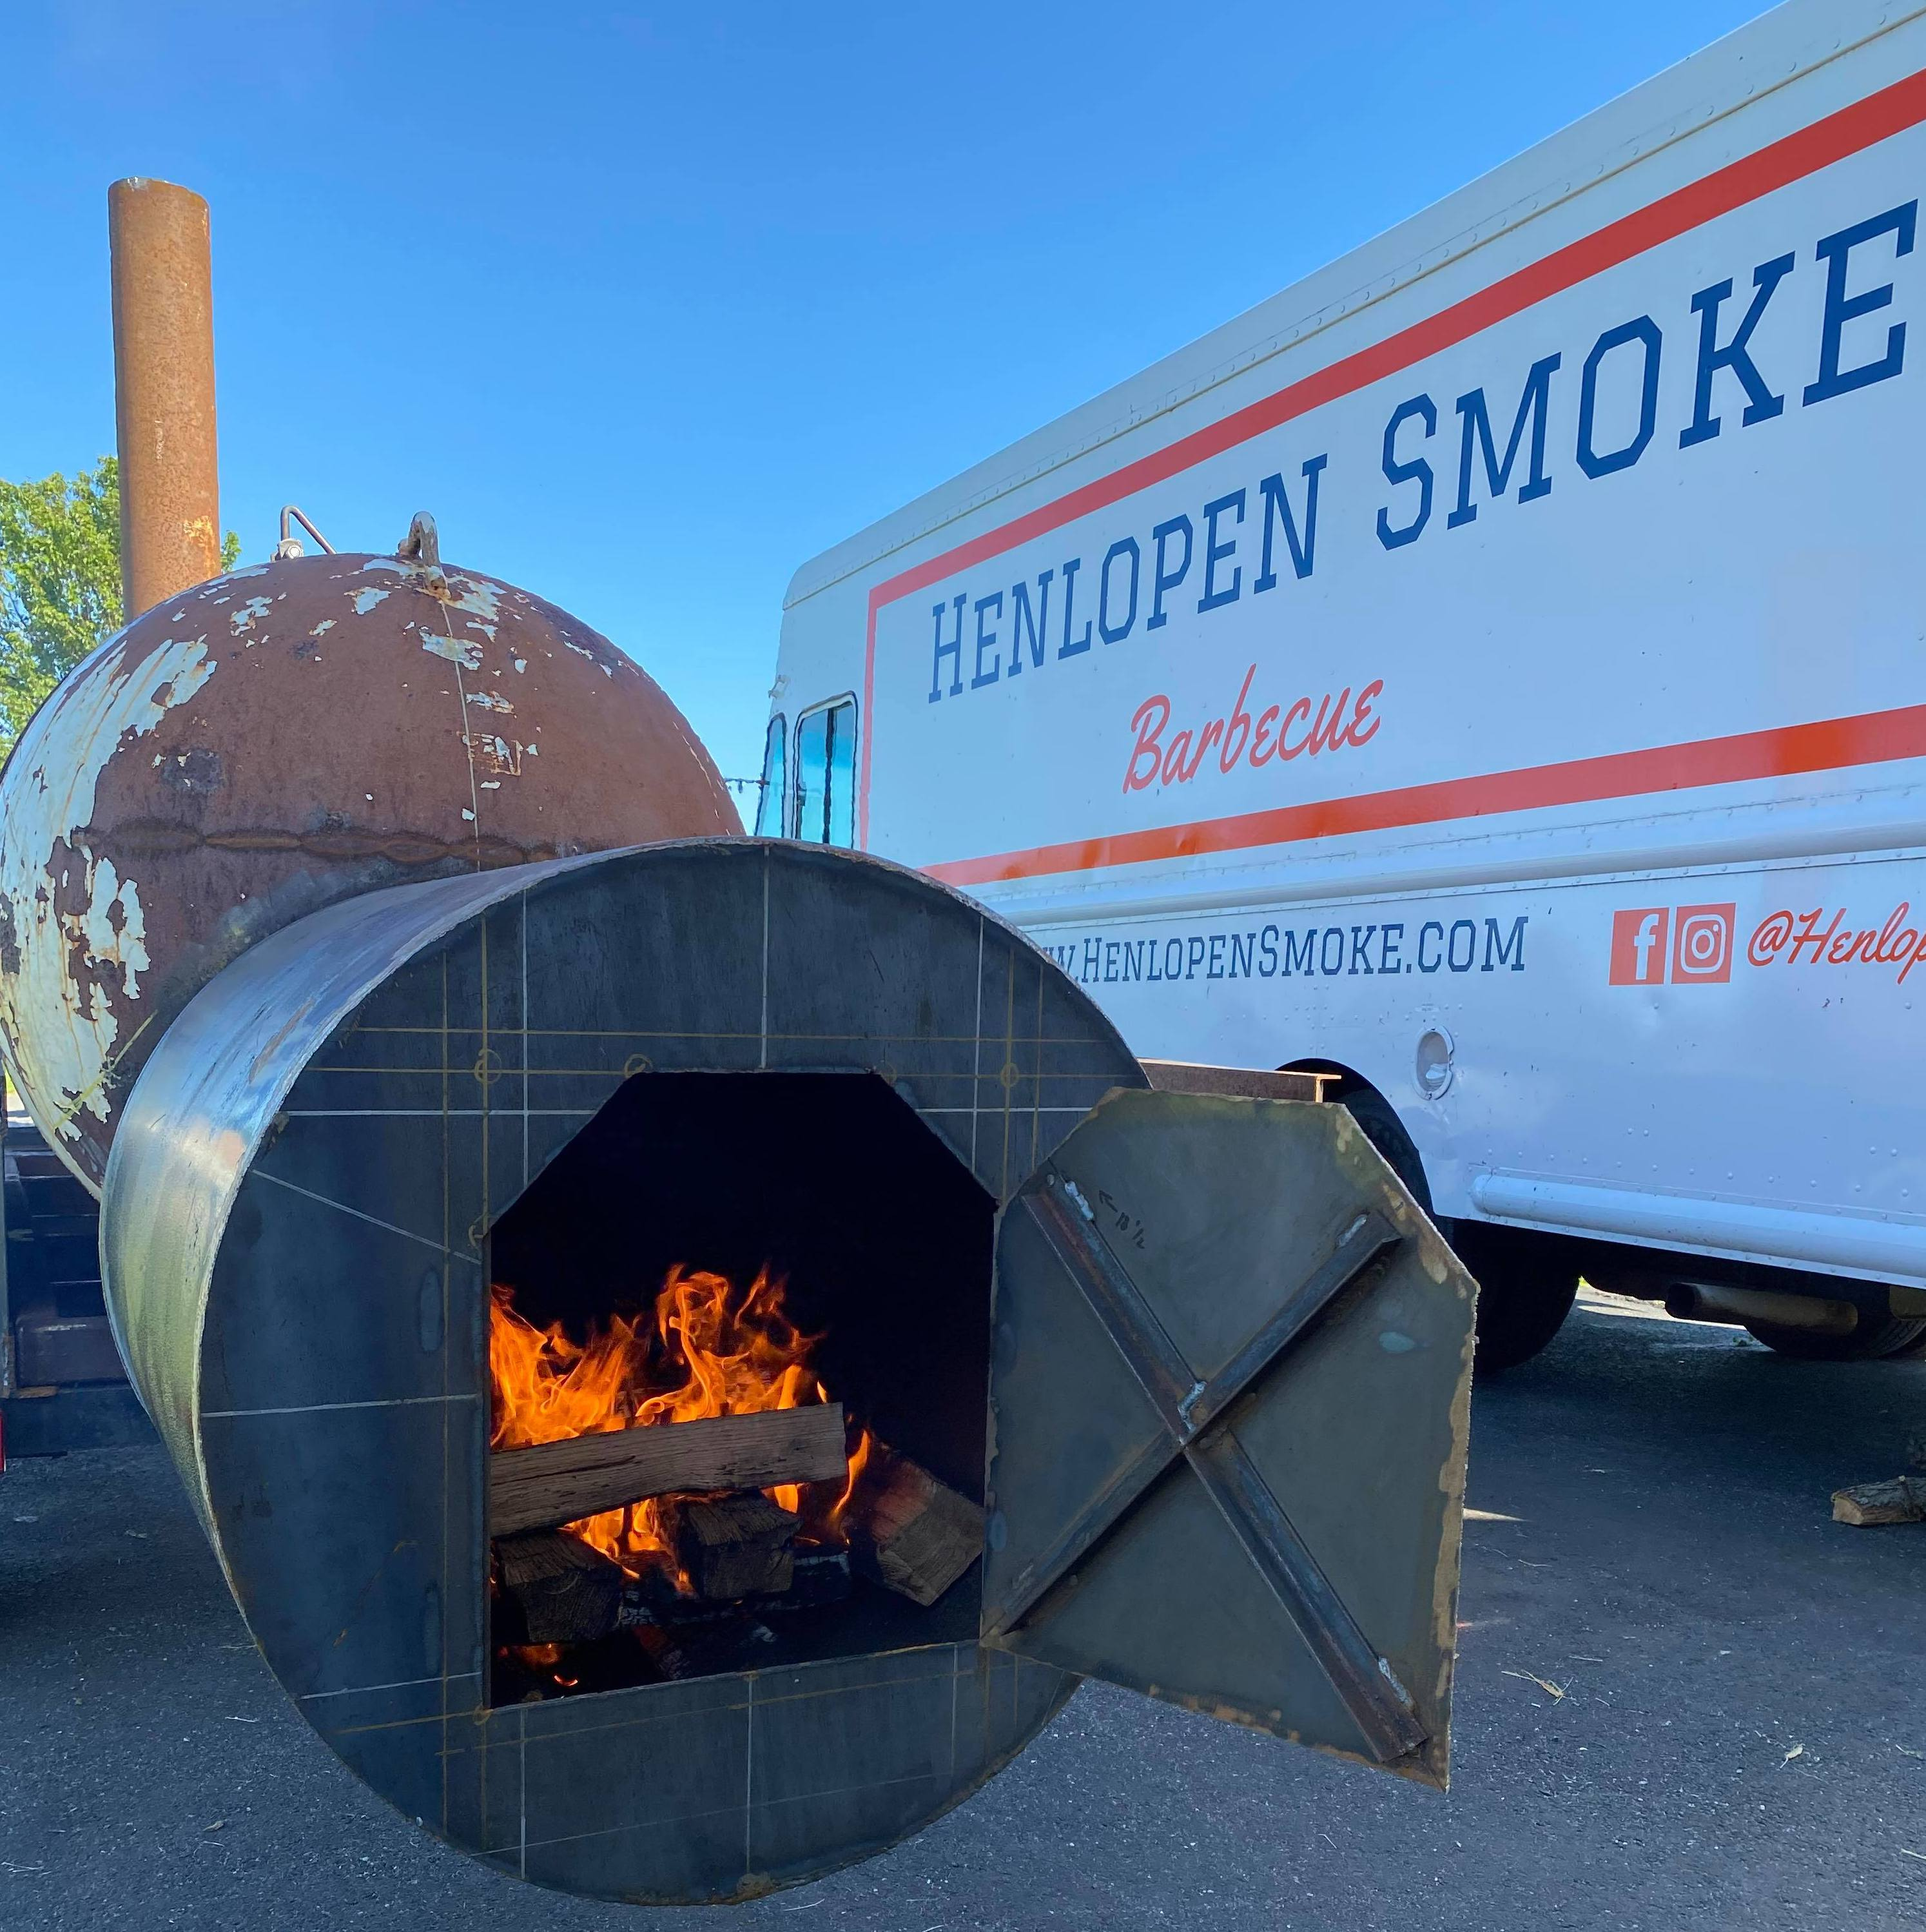 Henlopen Smoke Smoker and Food Truck